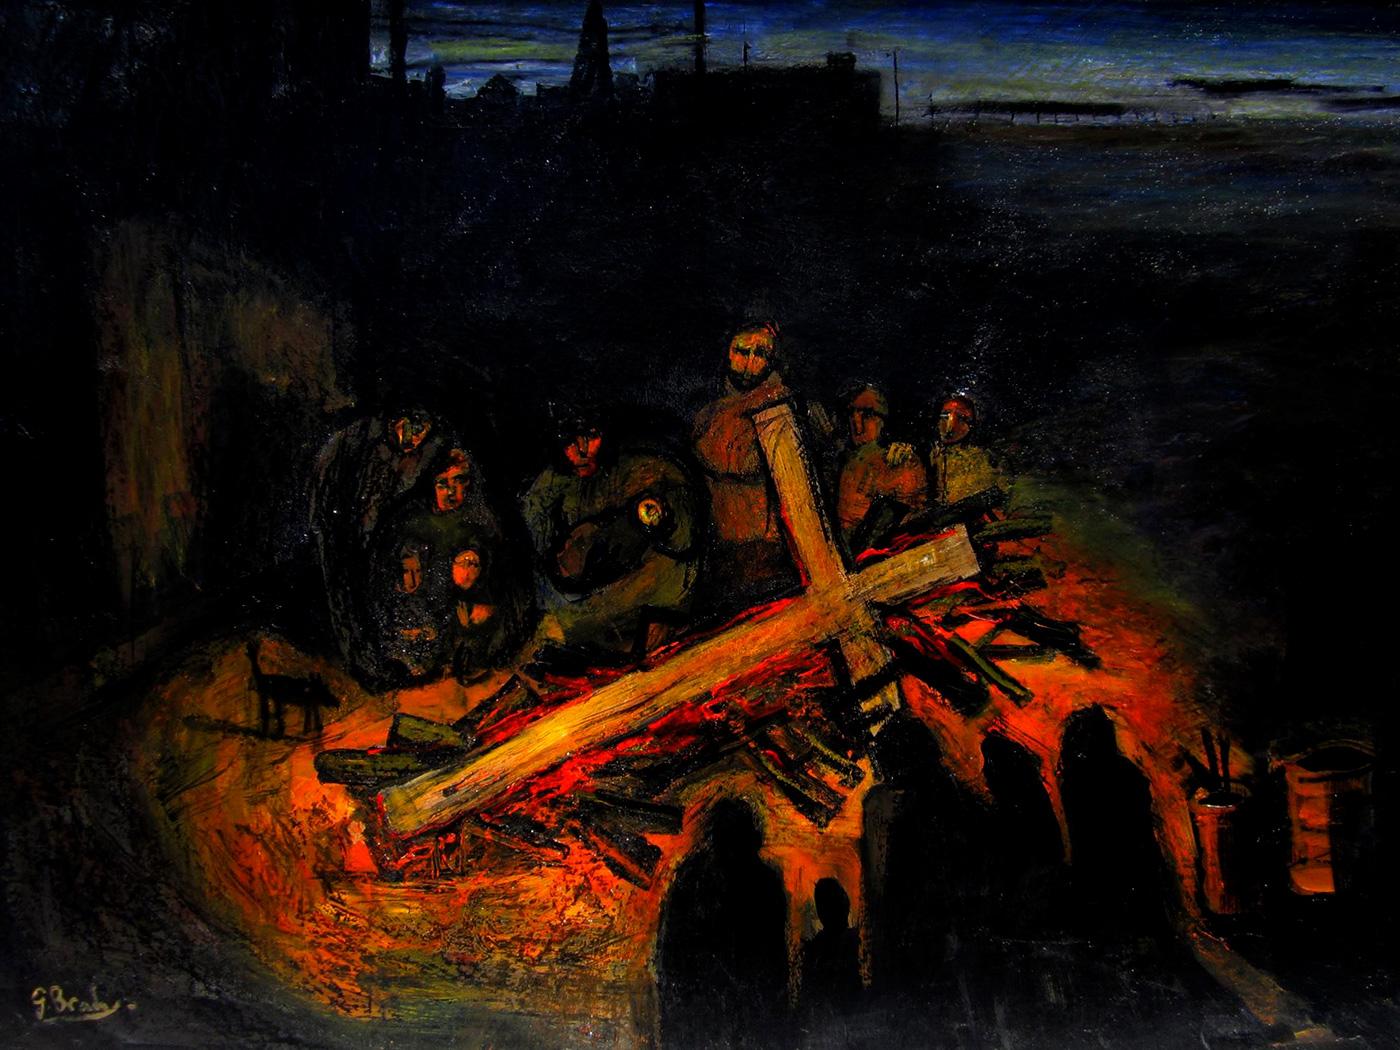 Glenn Brady - 'Homeless and Cross'